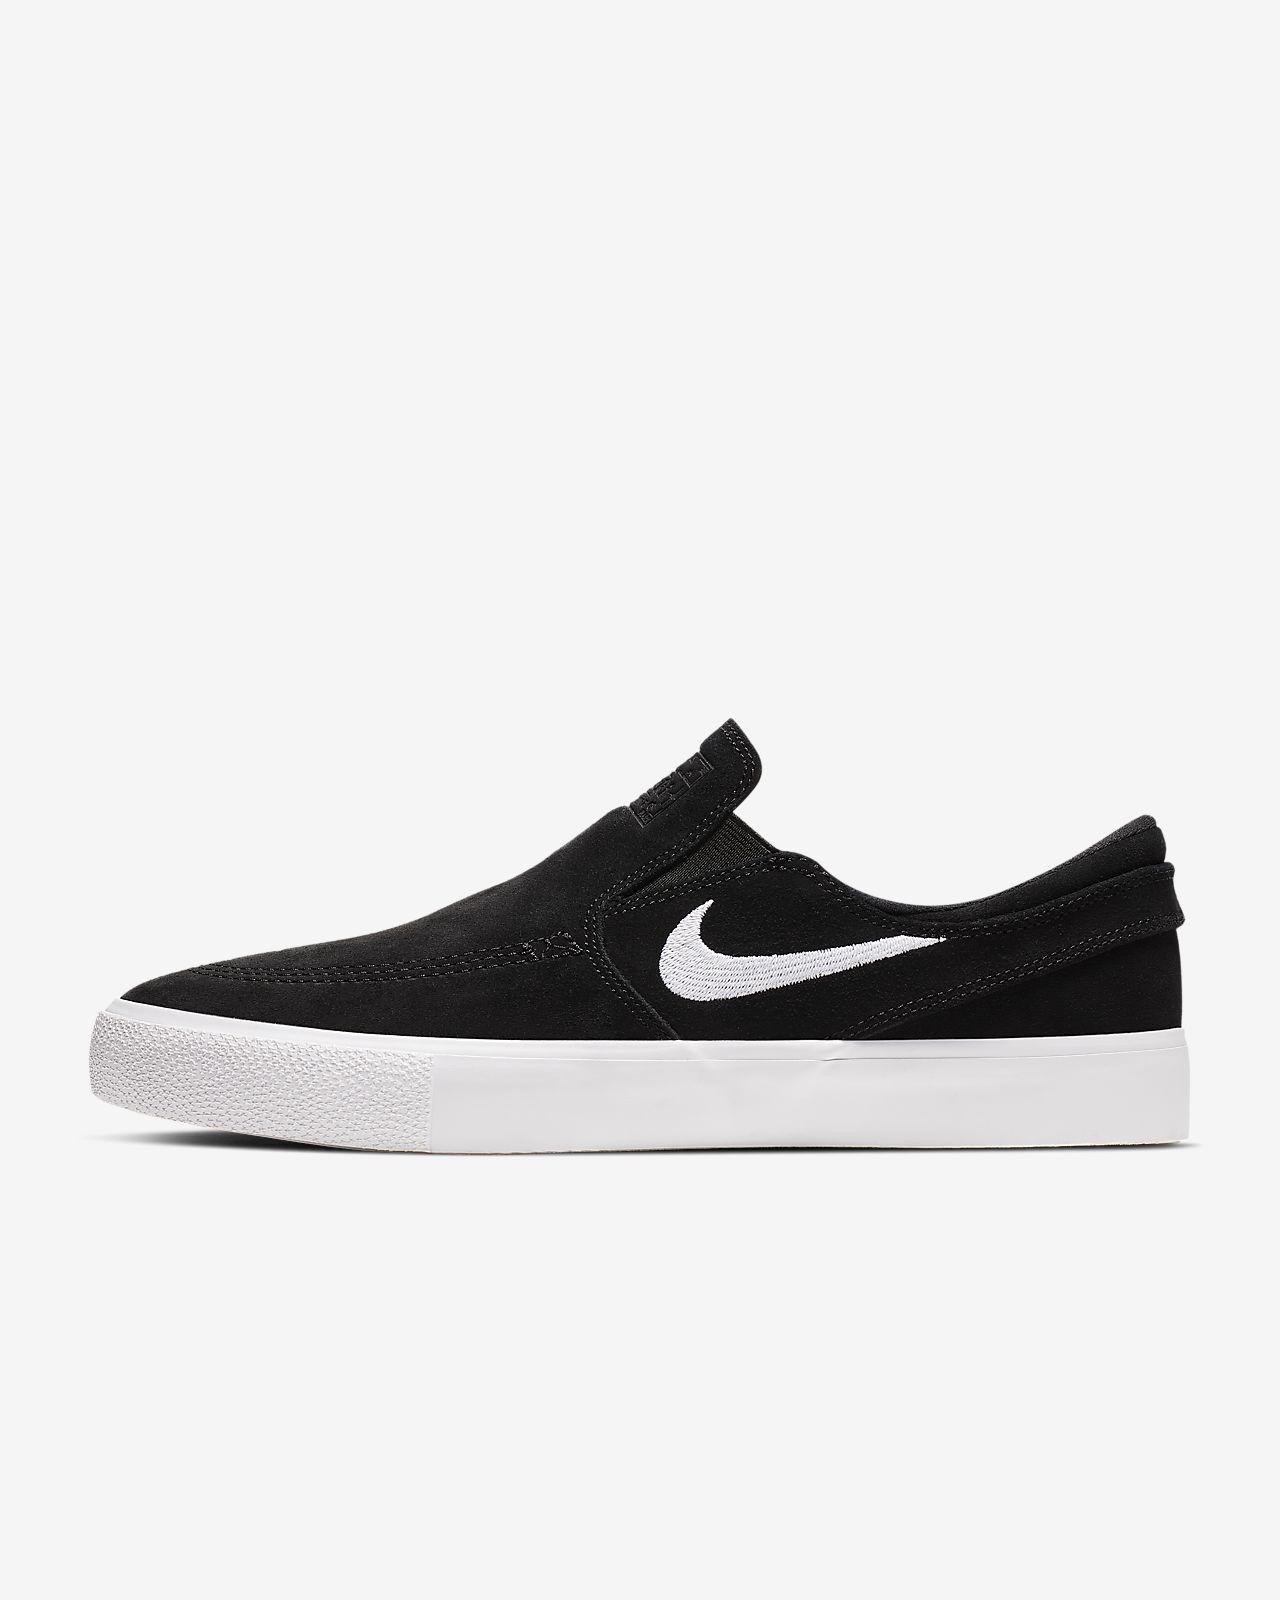 shoes for cheap shop info for Nike SB Zoom Stefan Janoski Slip RM Skate Shoe